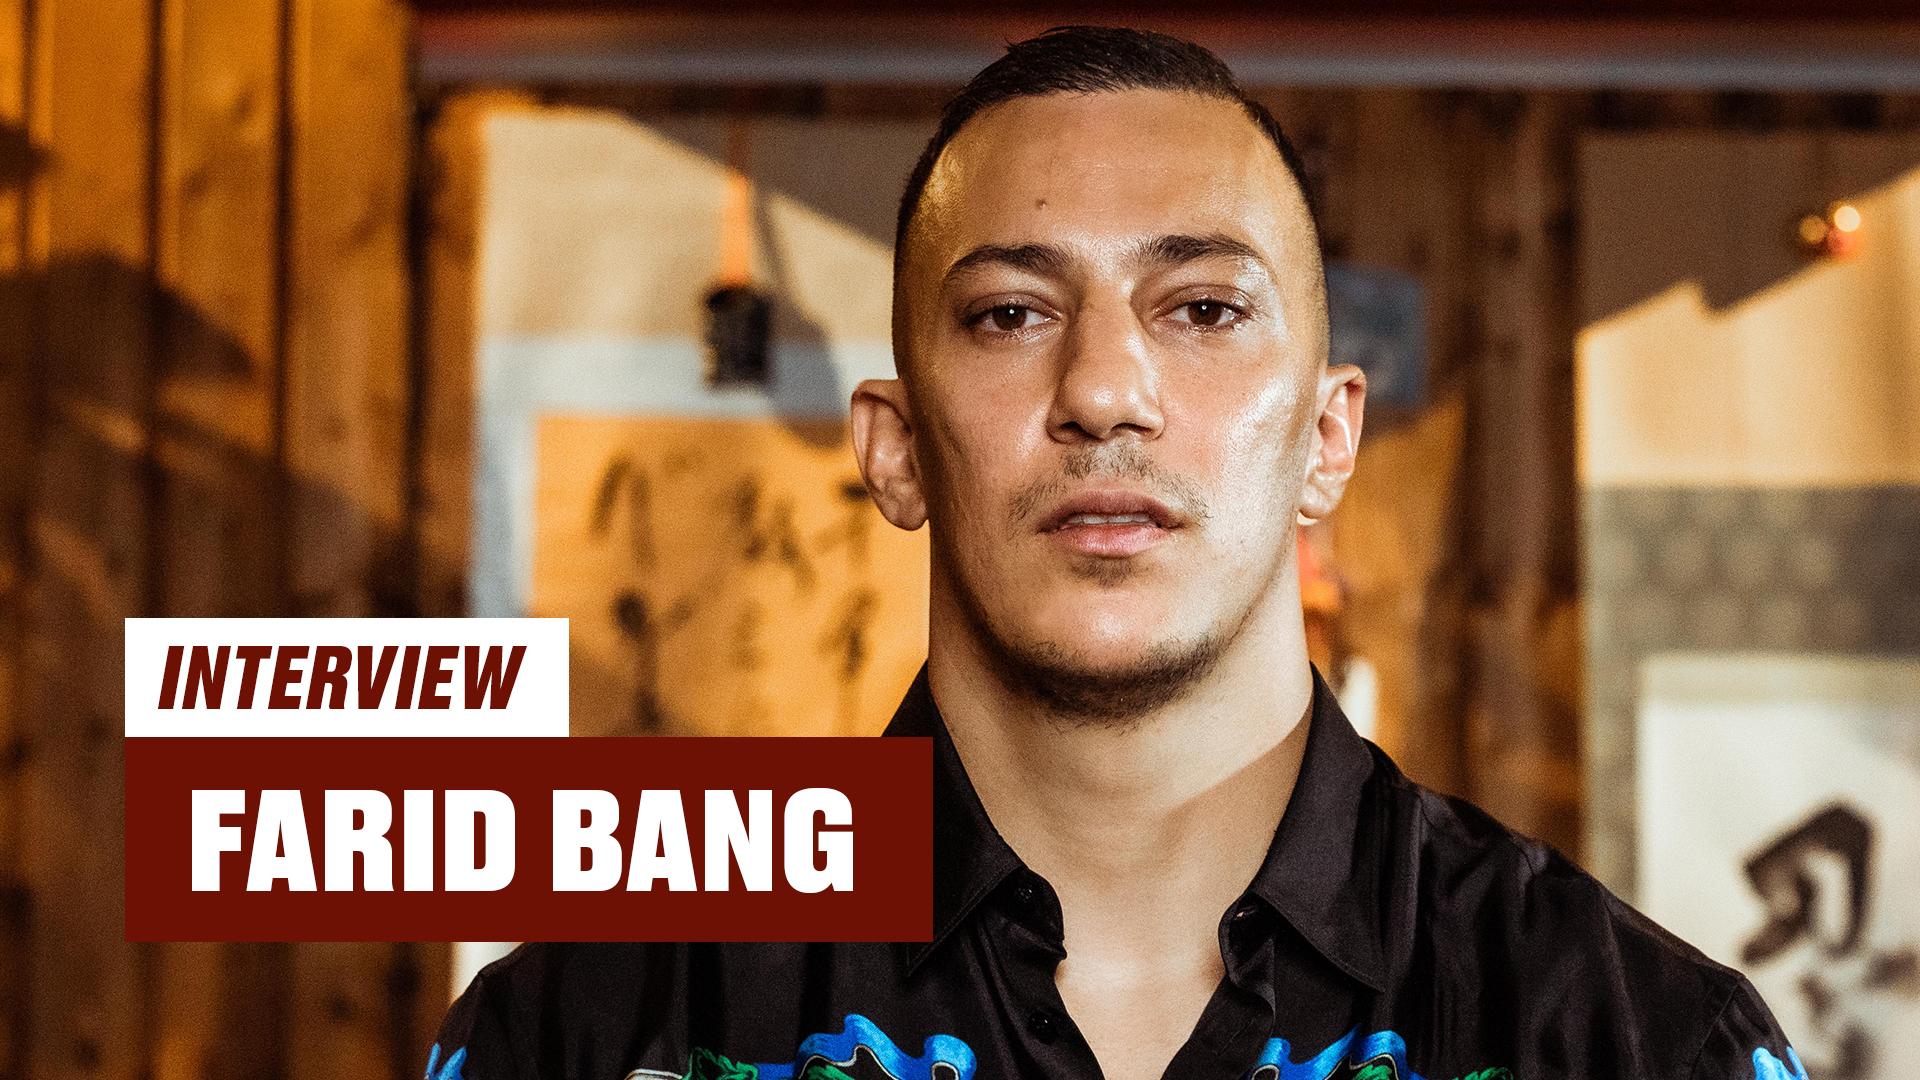 Farid Bang Interview: Beef, erste Lyrics & Frauenwitze | 16BARS